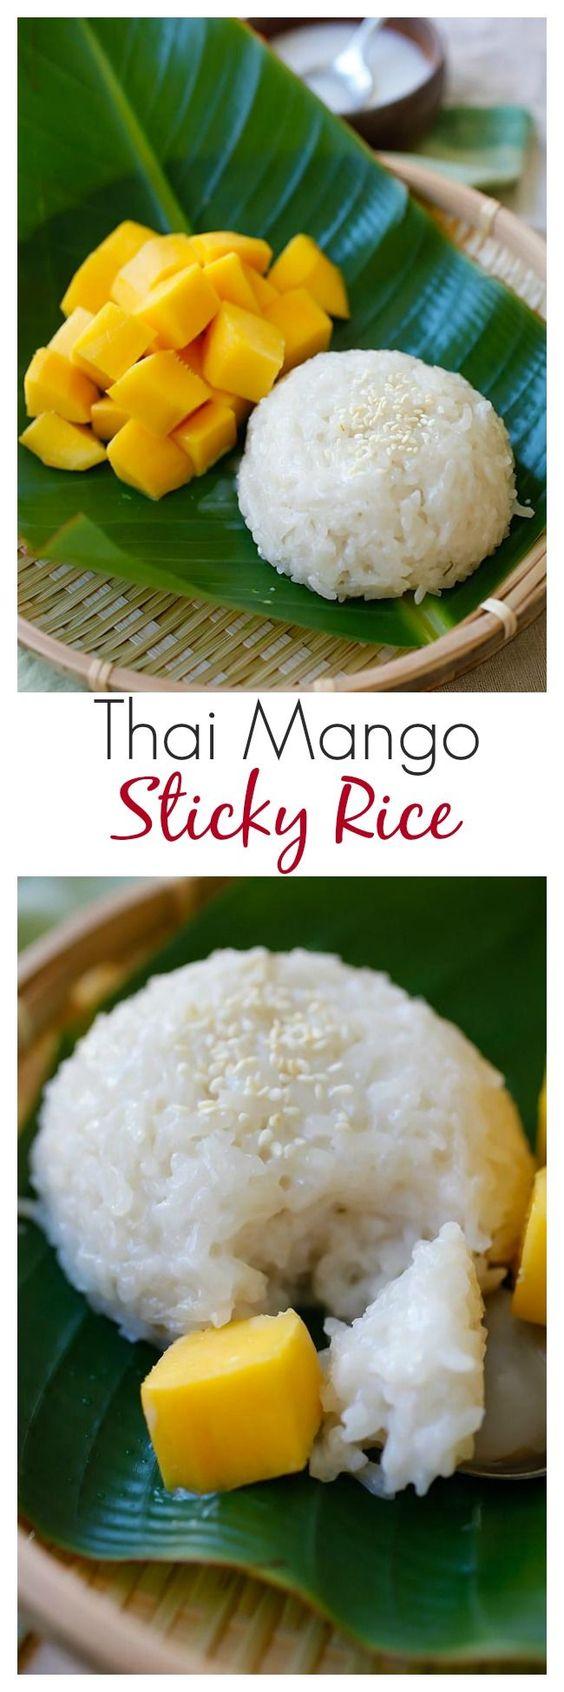 Authentic Thai Mango Sticky Rice (just subtract the pandan ...